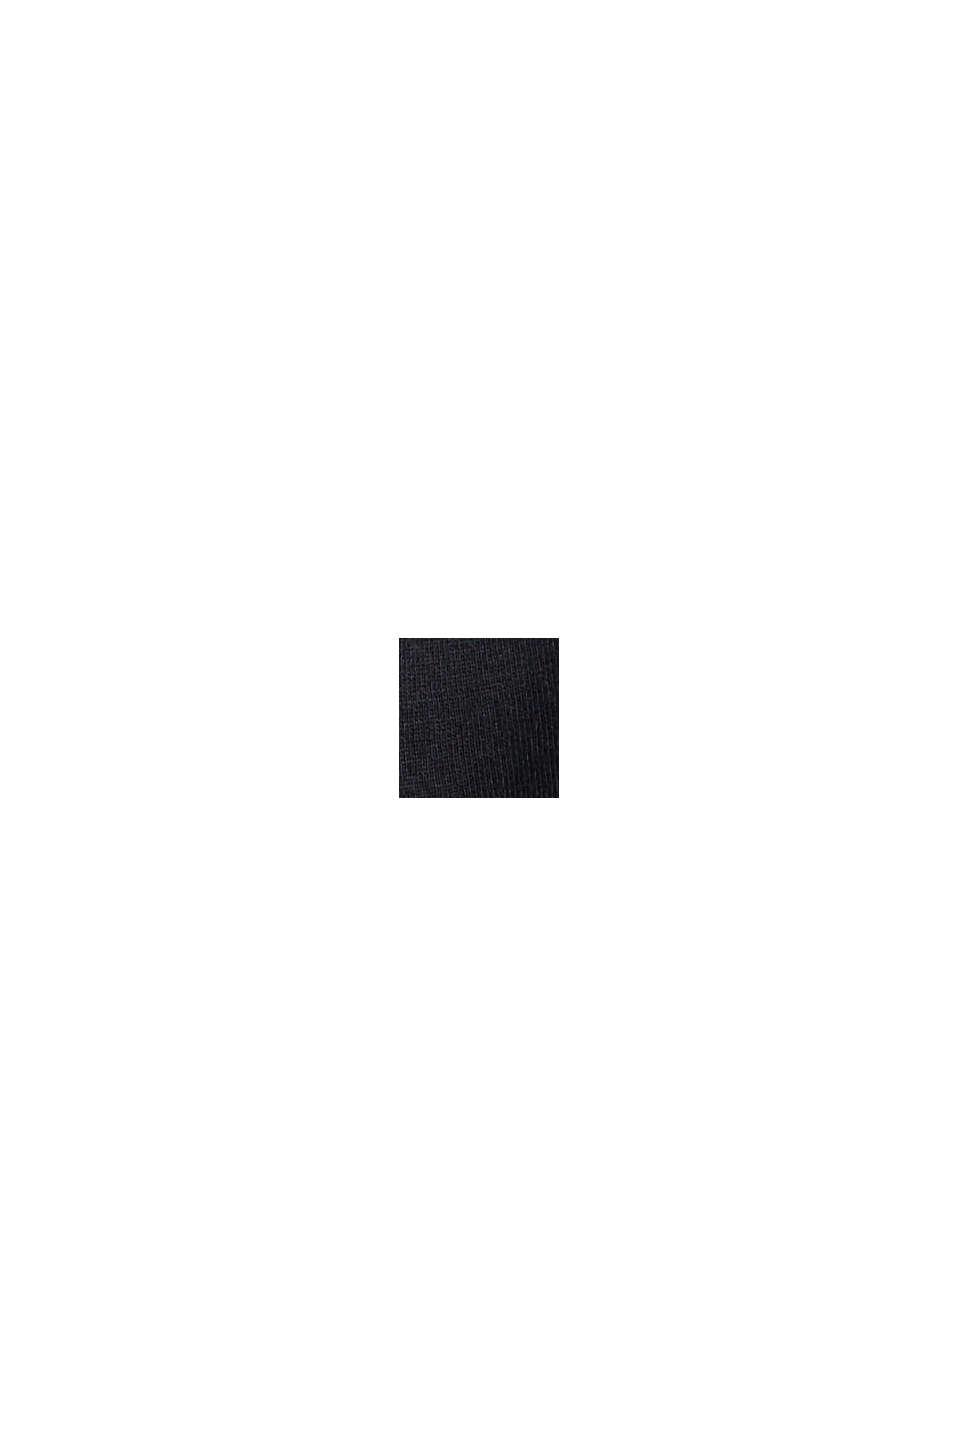 Camiseta de manga larga con frunces, algodón ecológico, BLACK, swatch